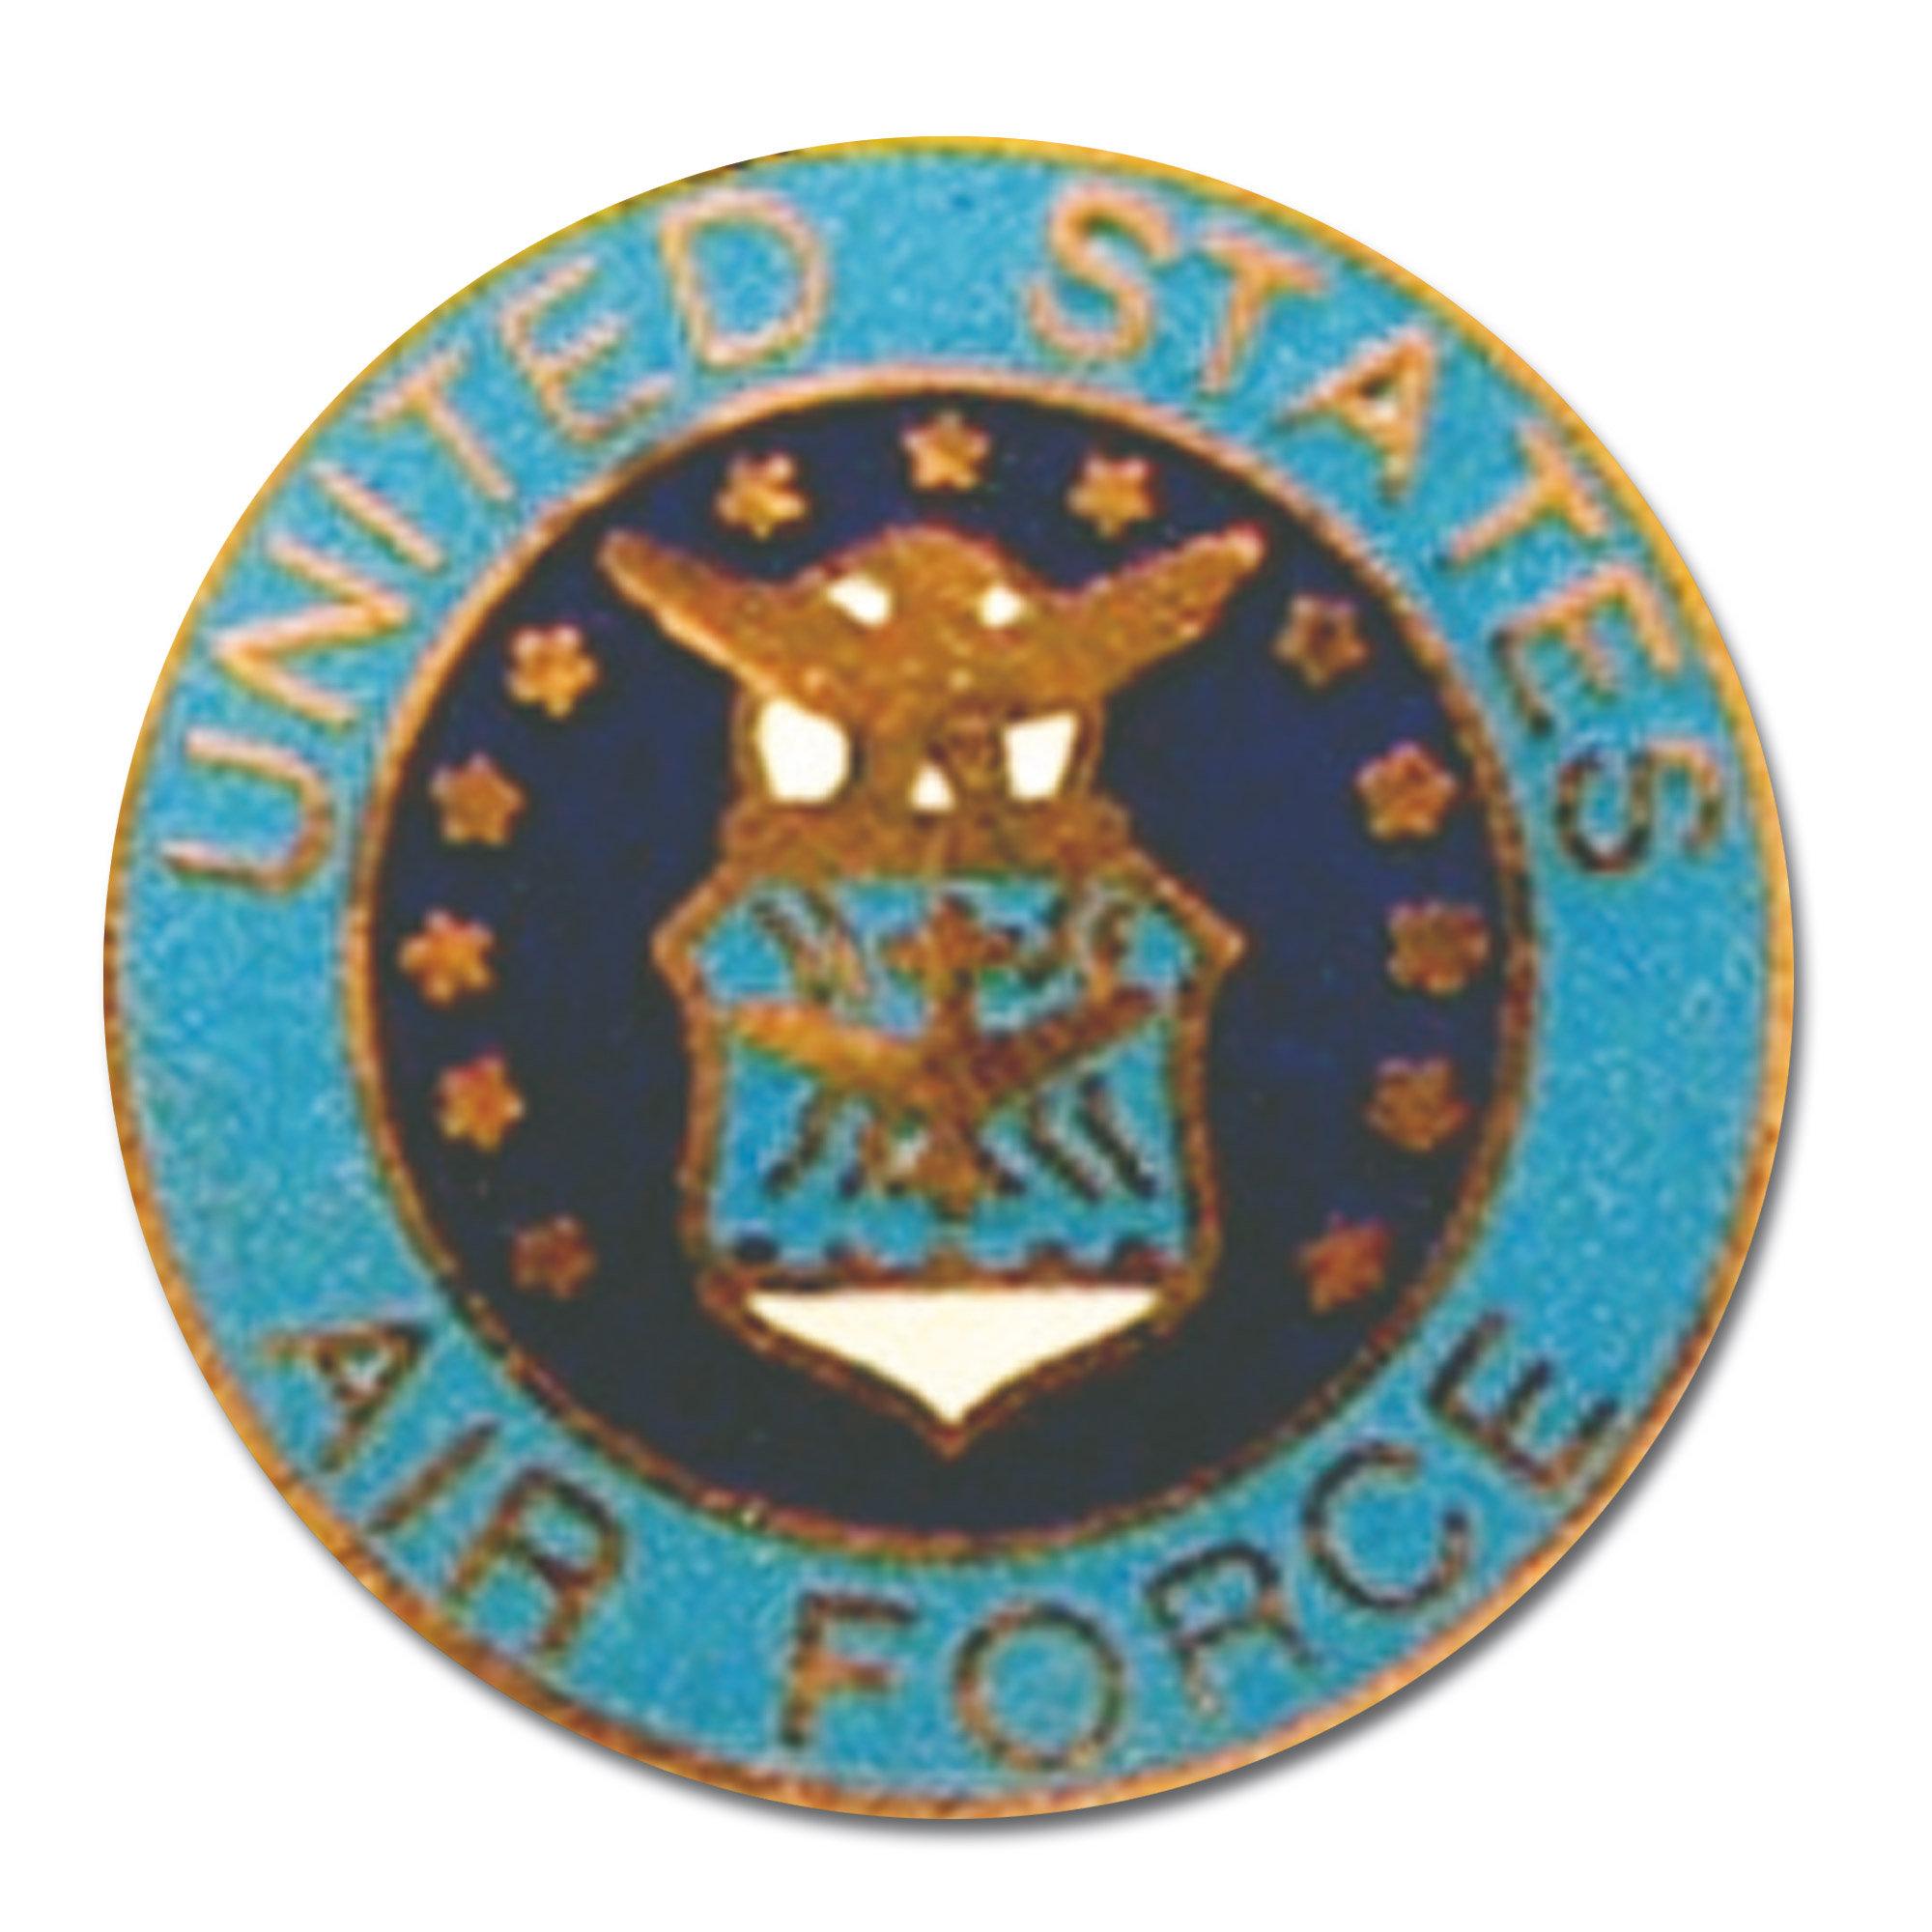 Pin US Air Force modello precedente